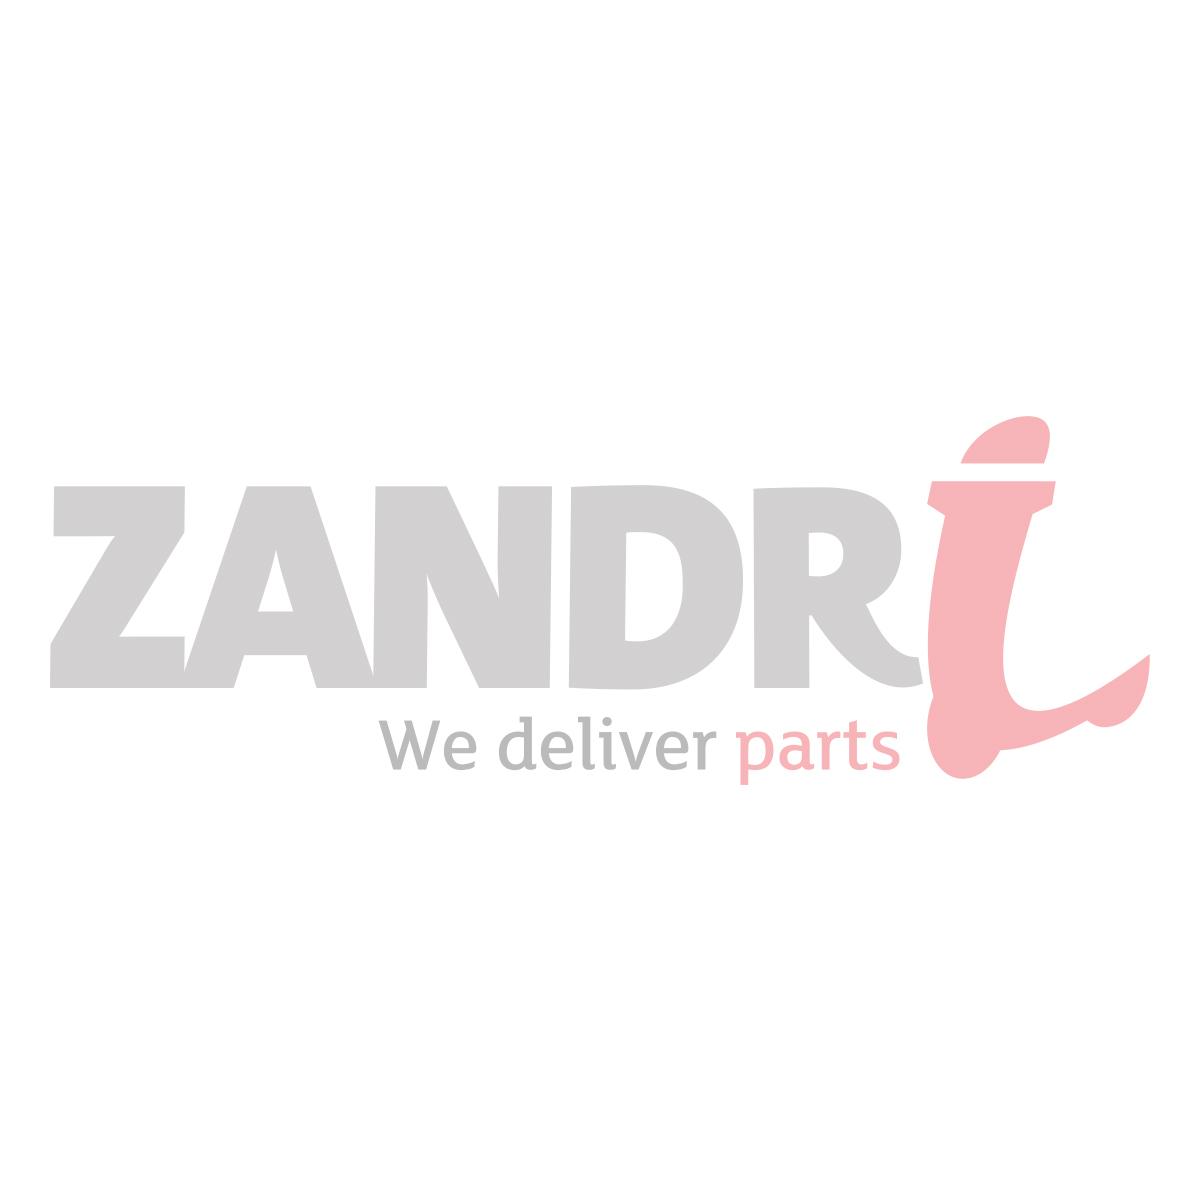 Carburateur- Luchtfilter Peugeot Tweet 4-takt